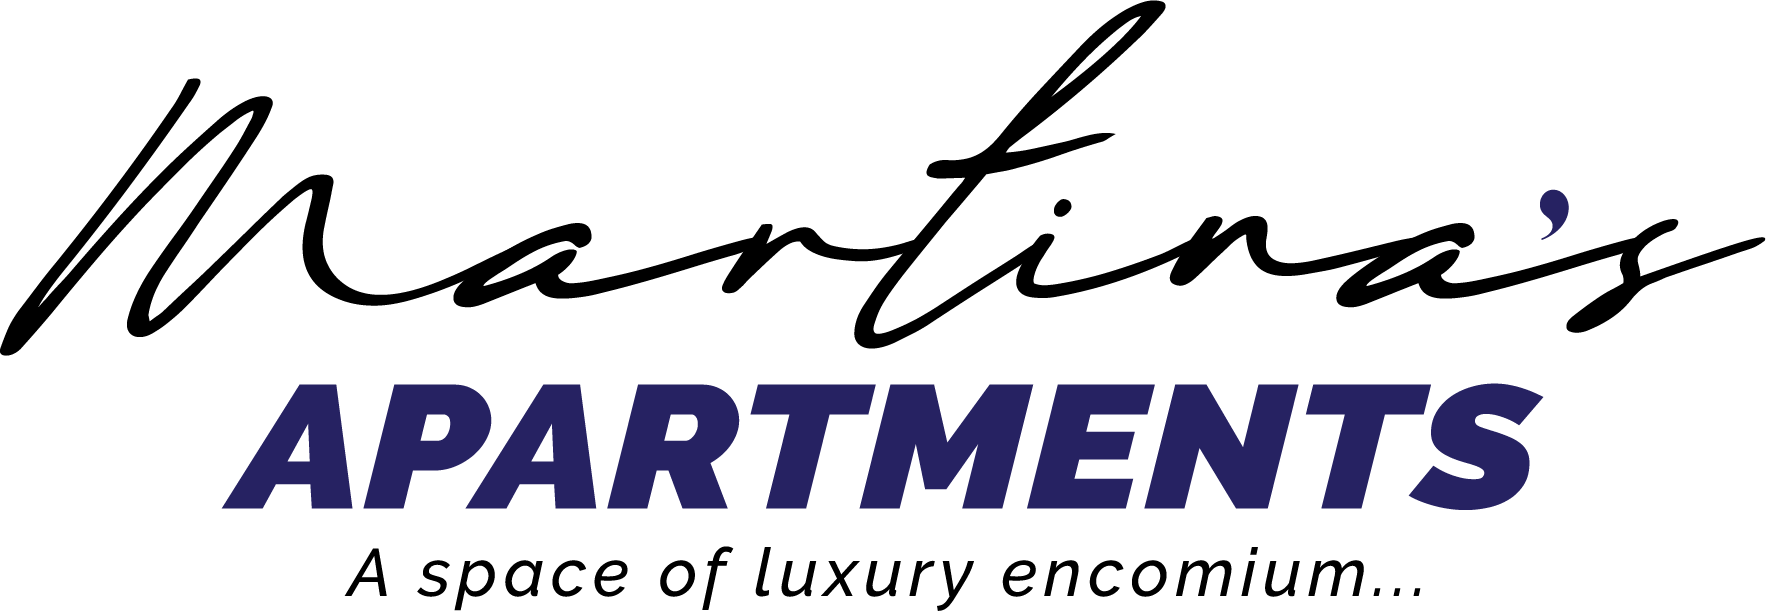 martina's apartments logo nigeria